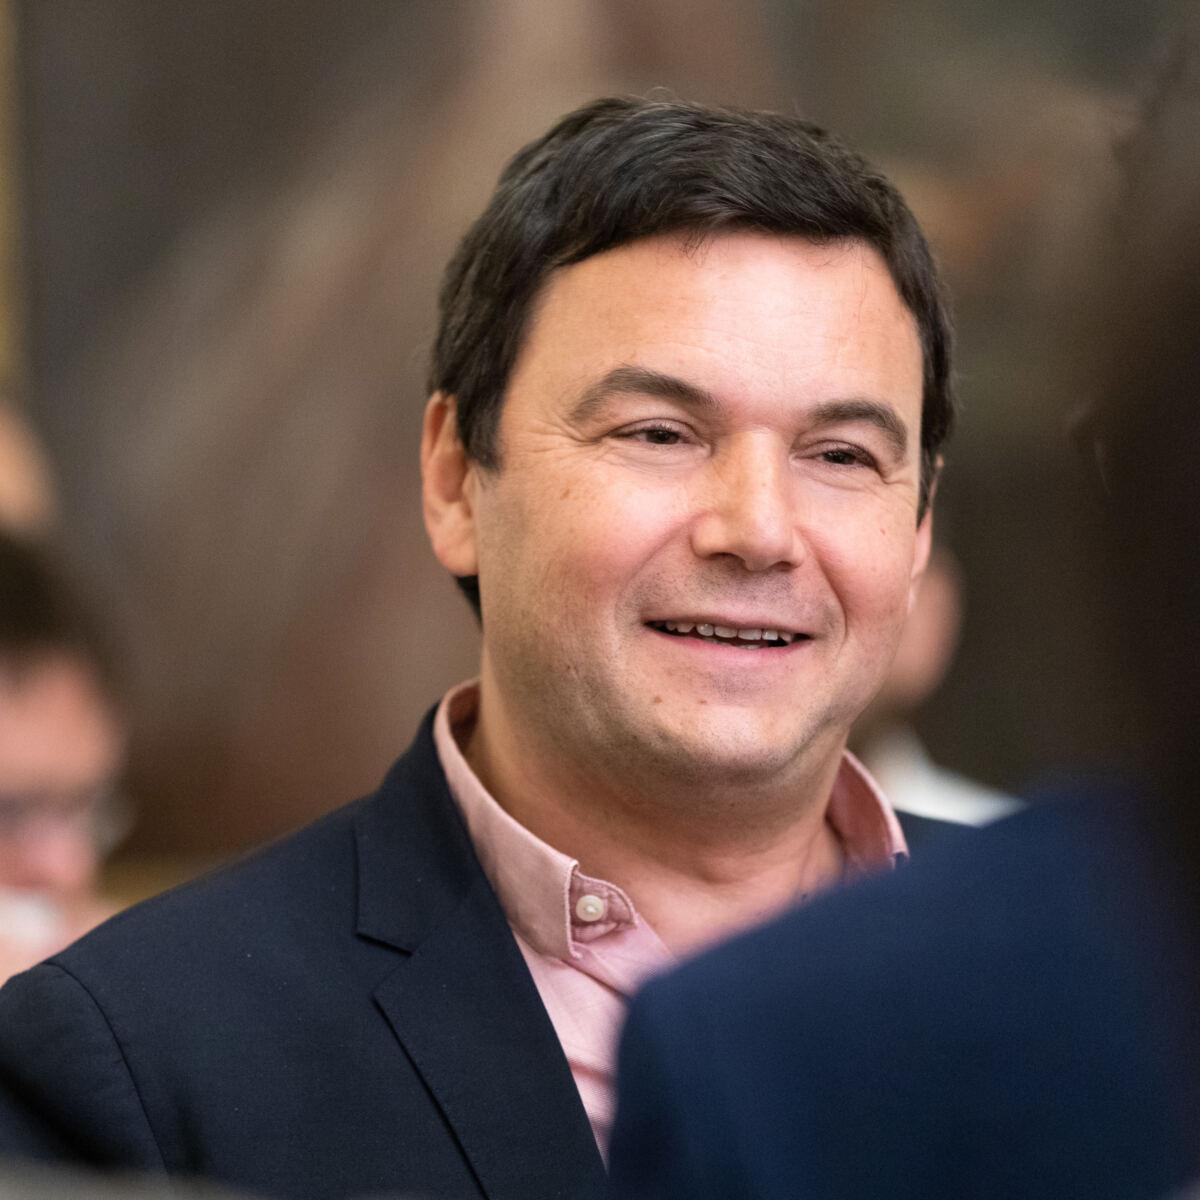 Thomas Piketty Center For European Studies At Harvard University